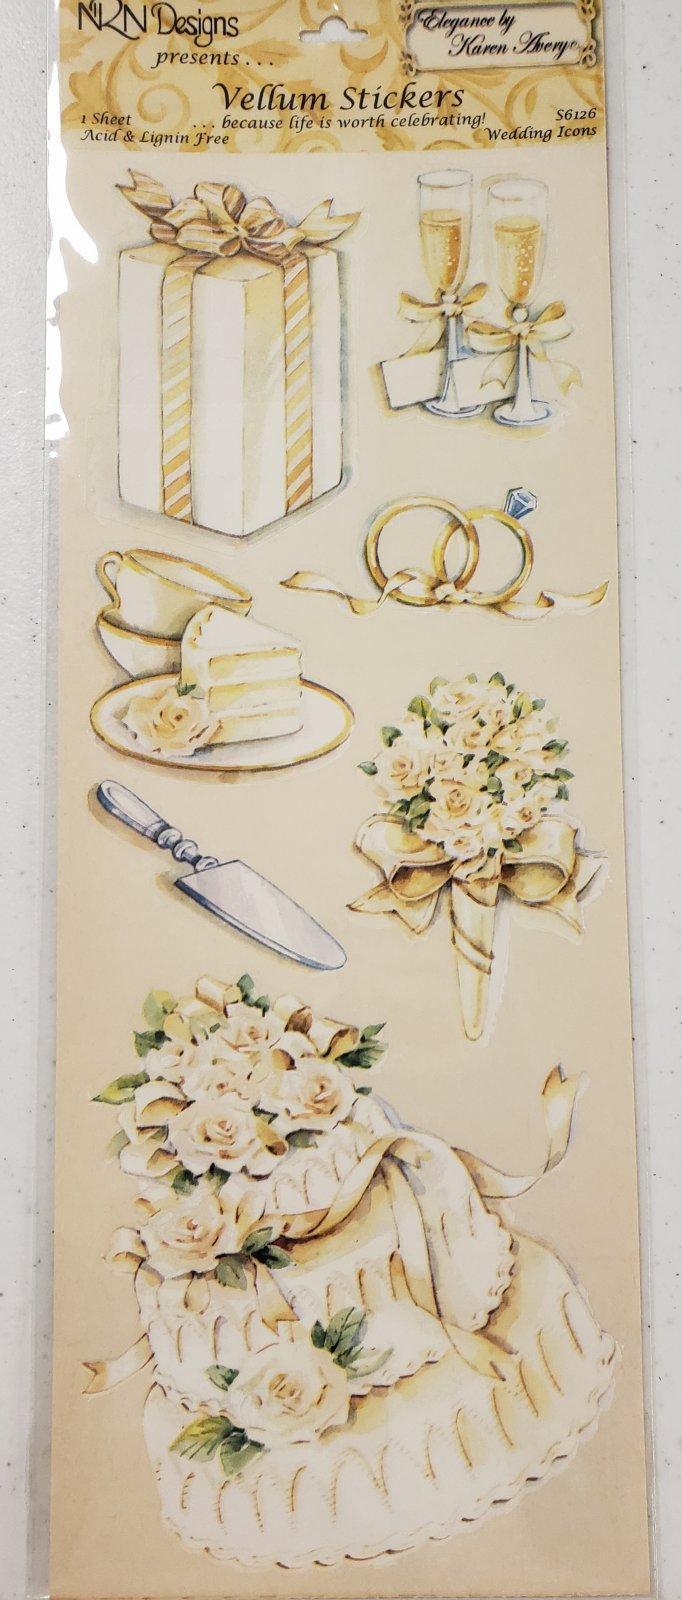 Nrn Designs Wedding Icons